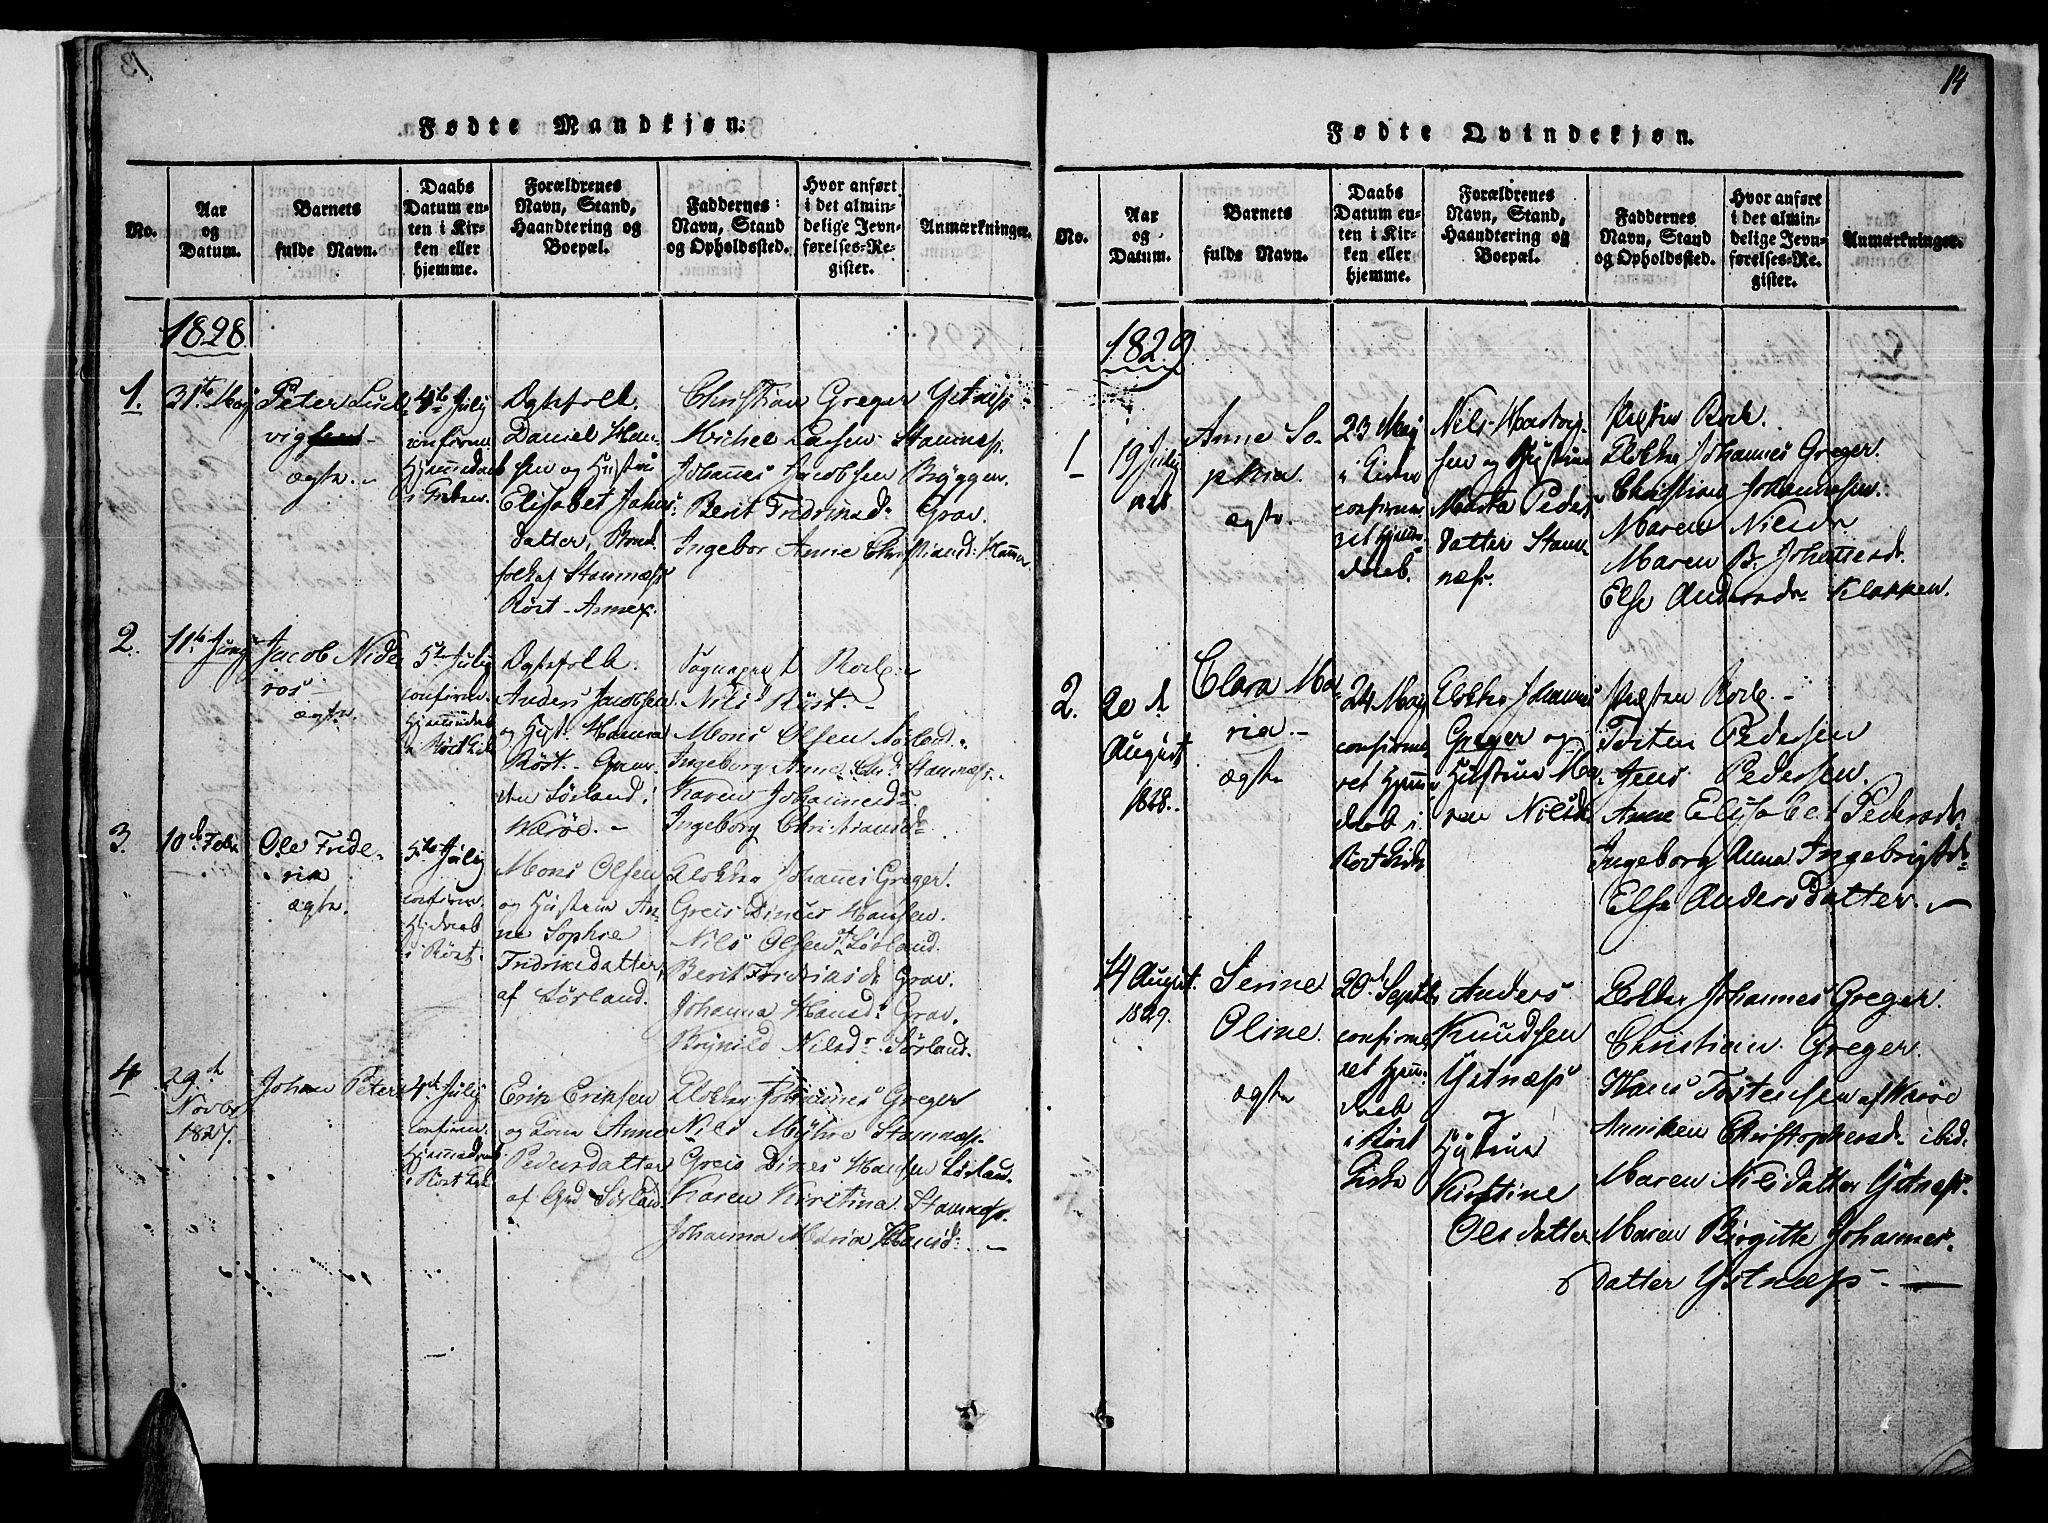 SAT, Ministerialprotokoller, klokkerbøker og fødselsregistre - Nordland, 807/L0120: Ministerialbok nr. 807A03, 1821-1848, s. 14